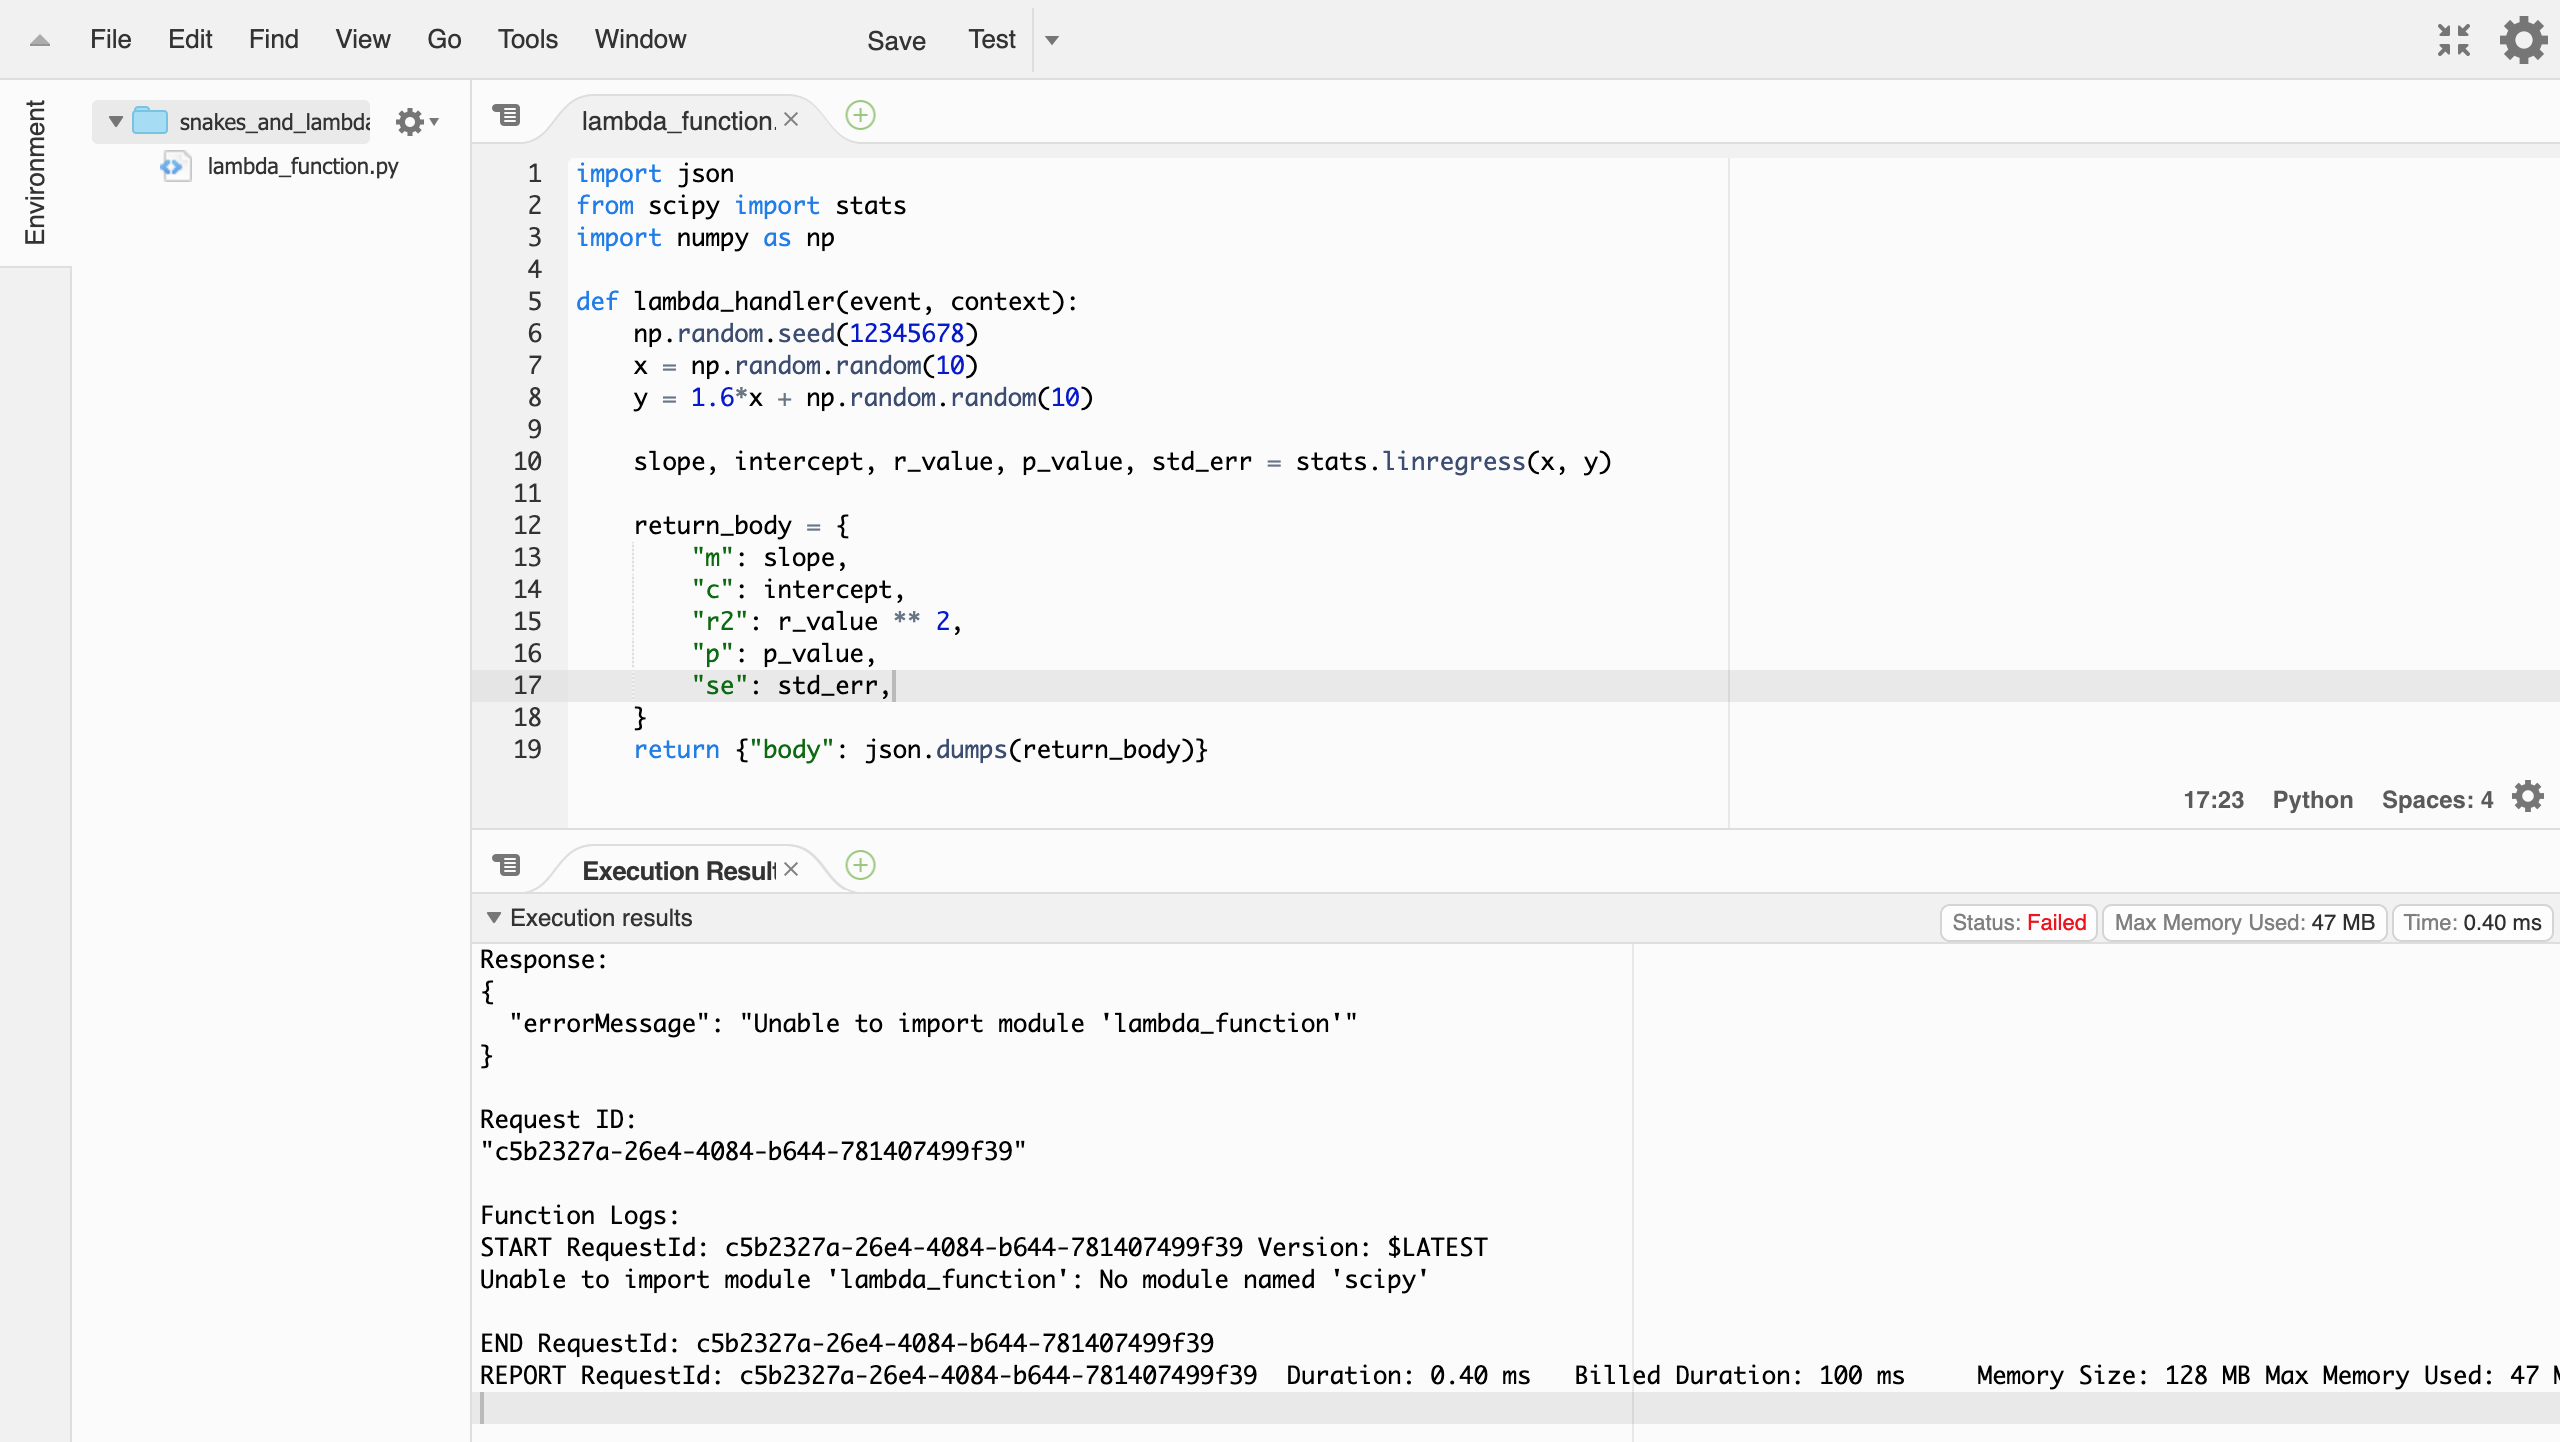 aws console lambda editor with an error message